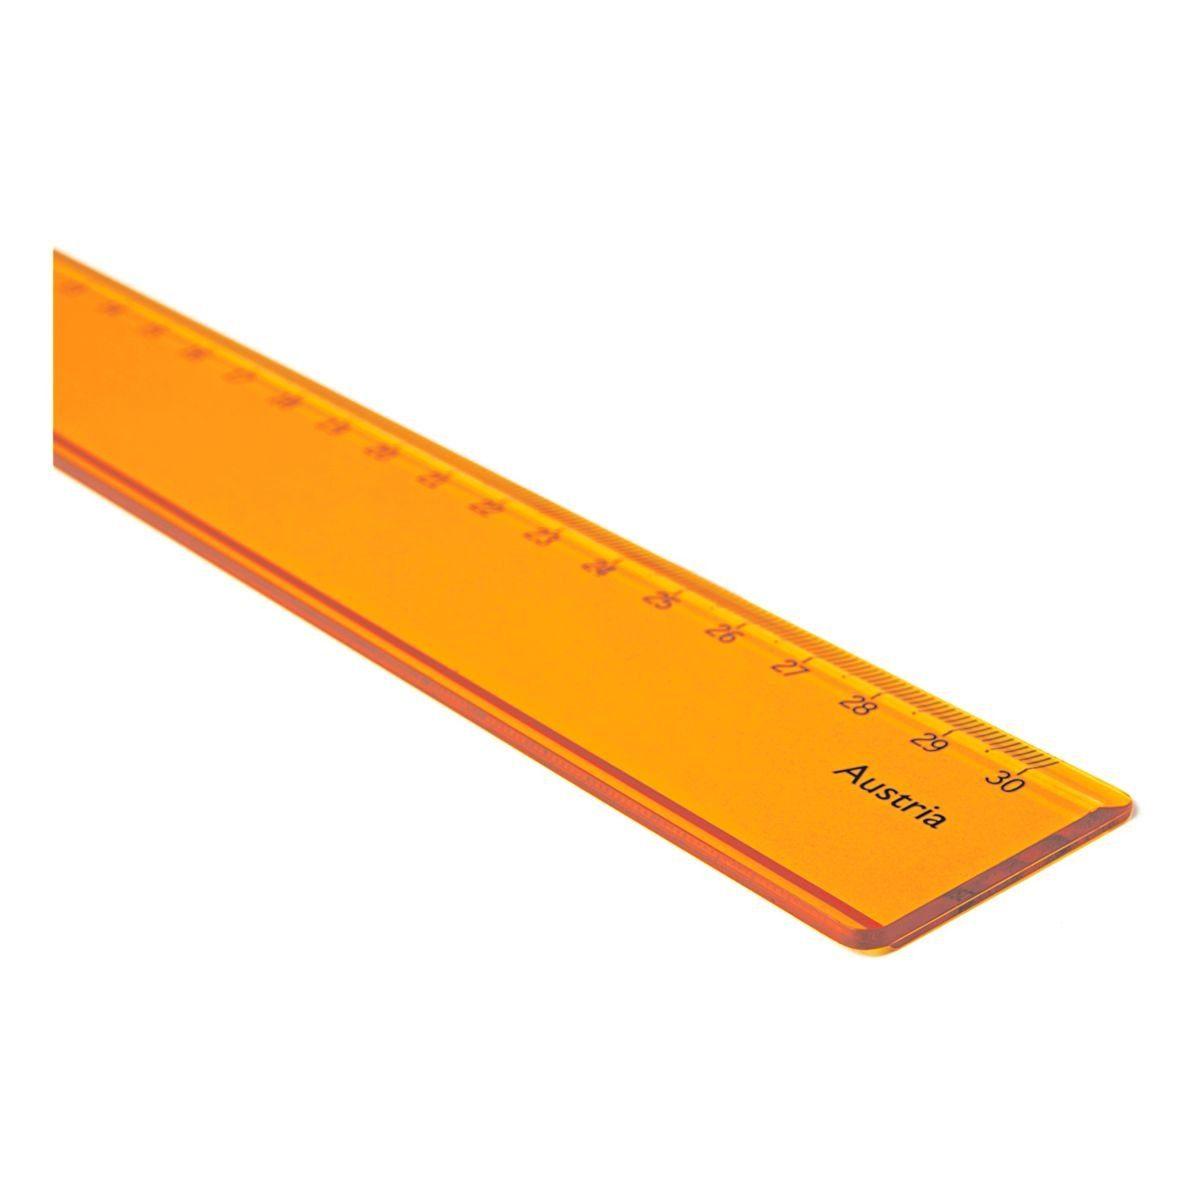 Aristo Lineal 30 cm »GEOContrast AR22030«